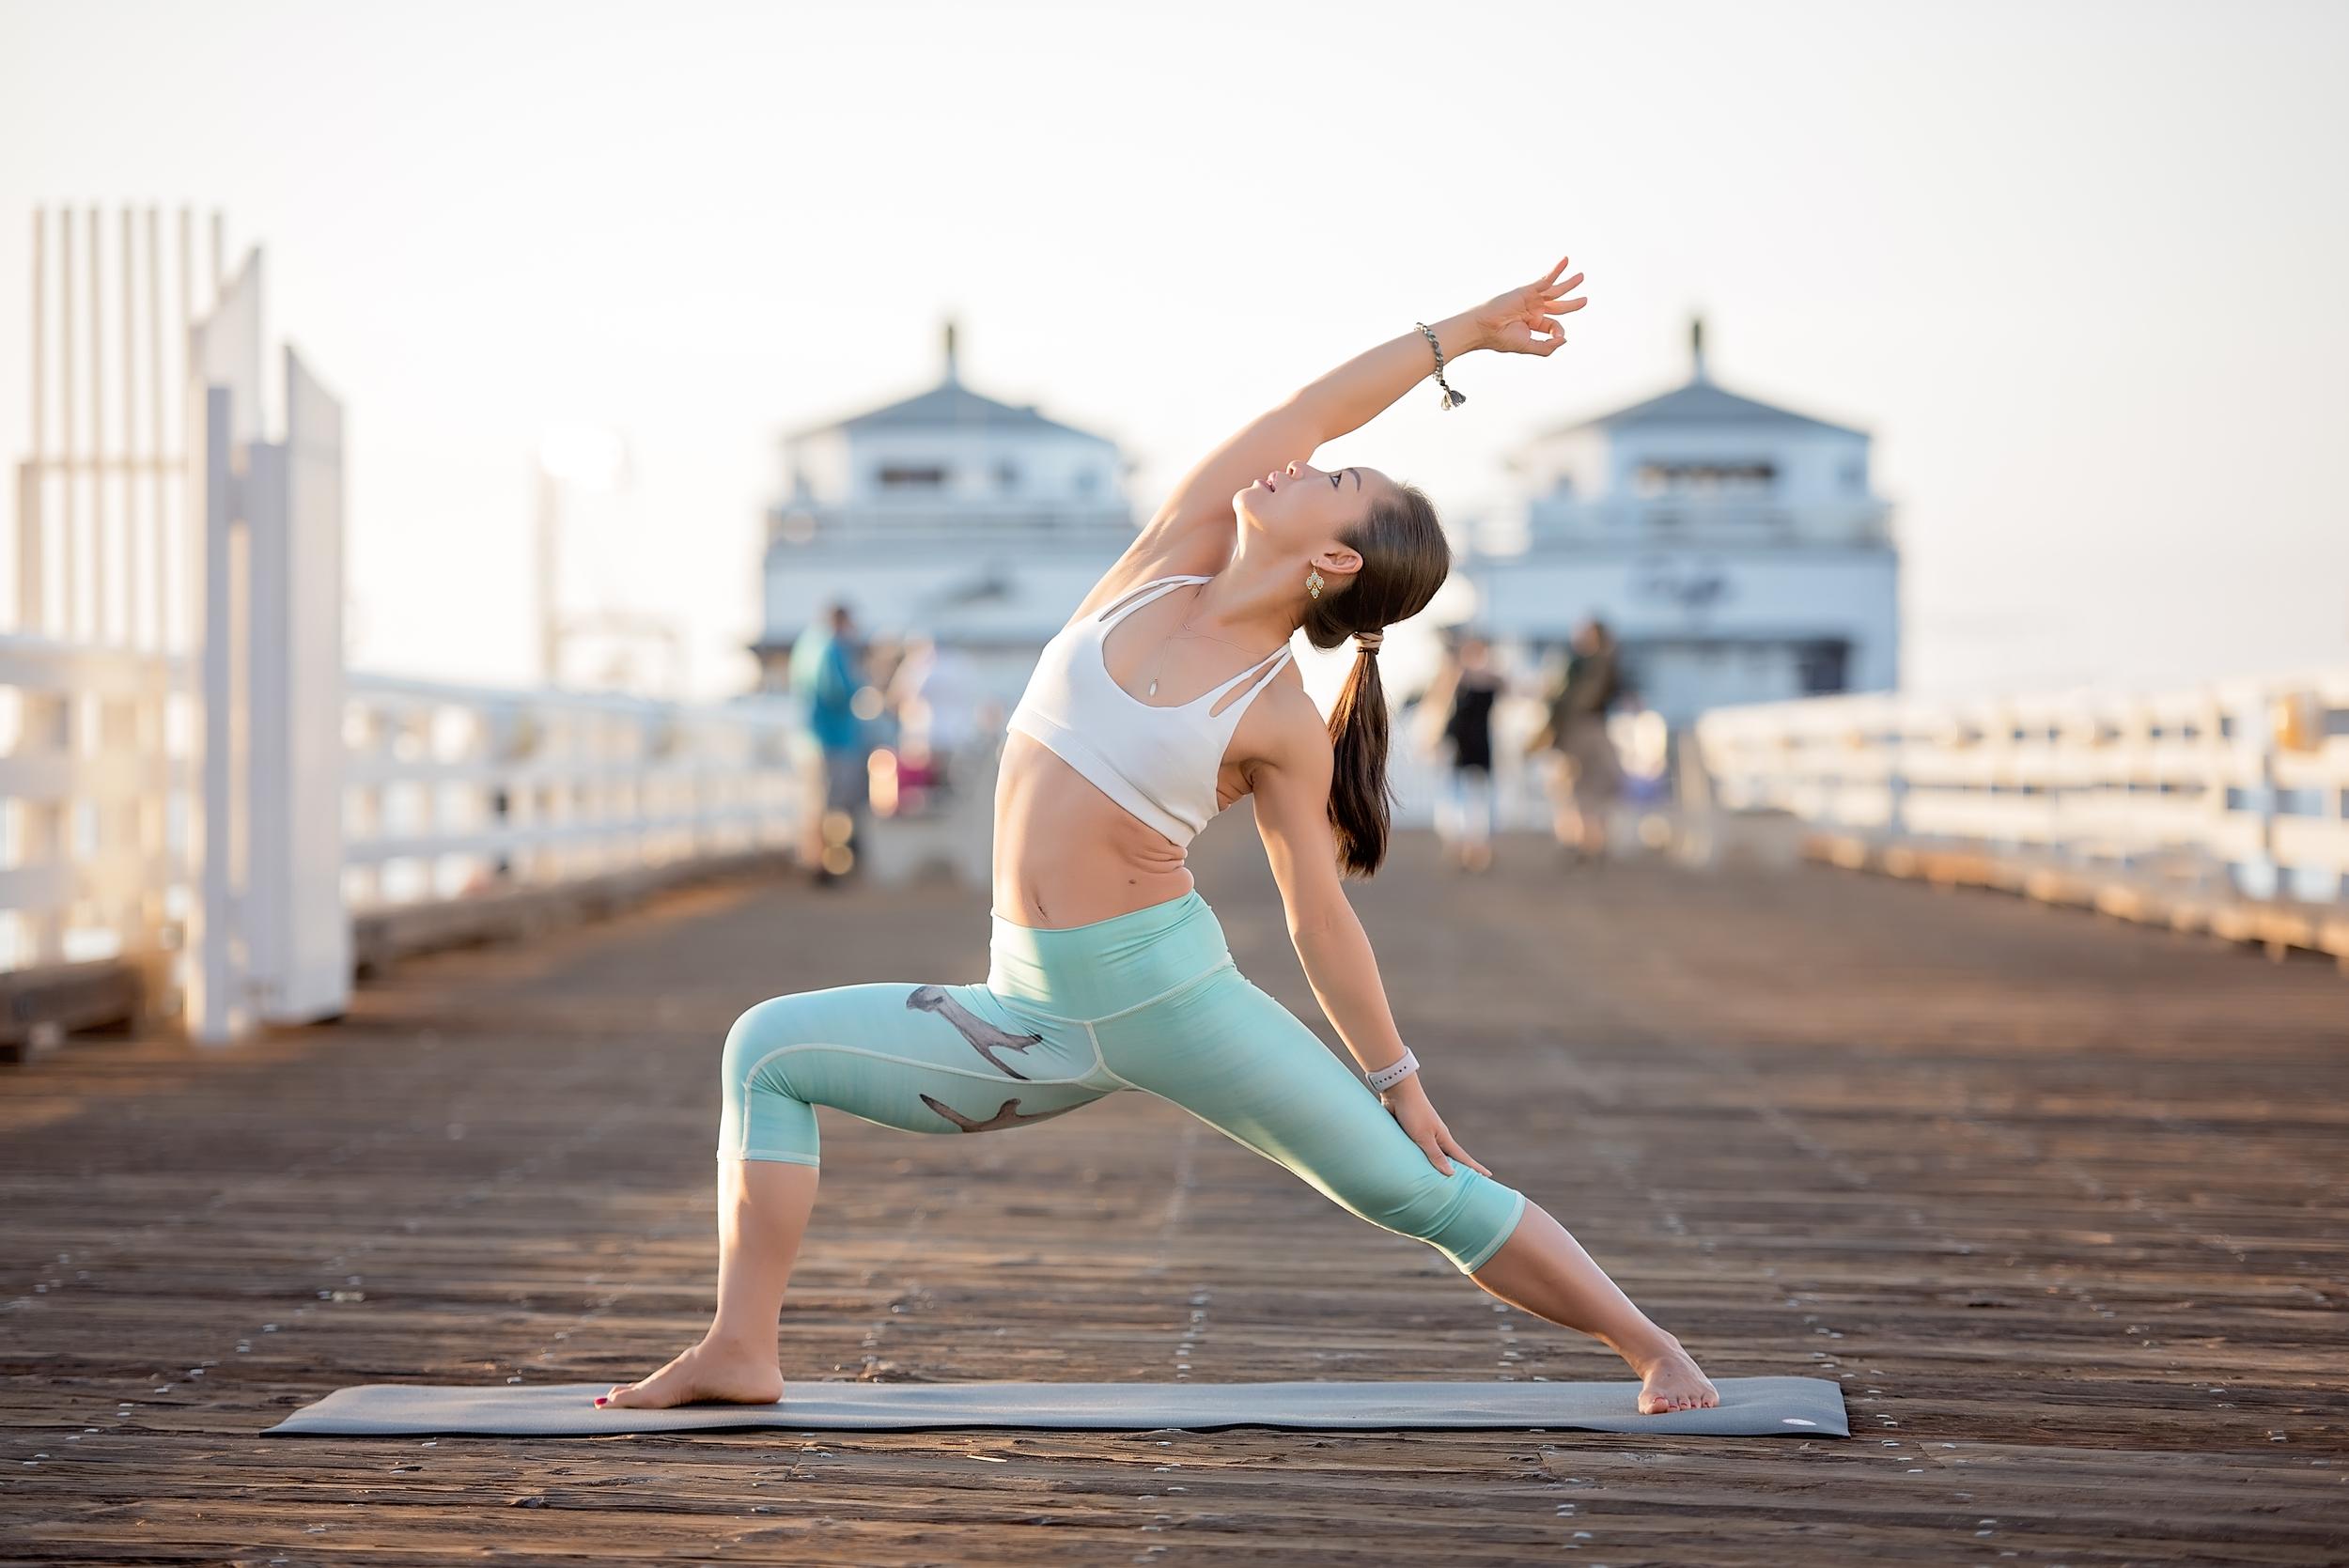 Yoga photography london and california han 0059 edit 2 jpg